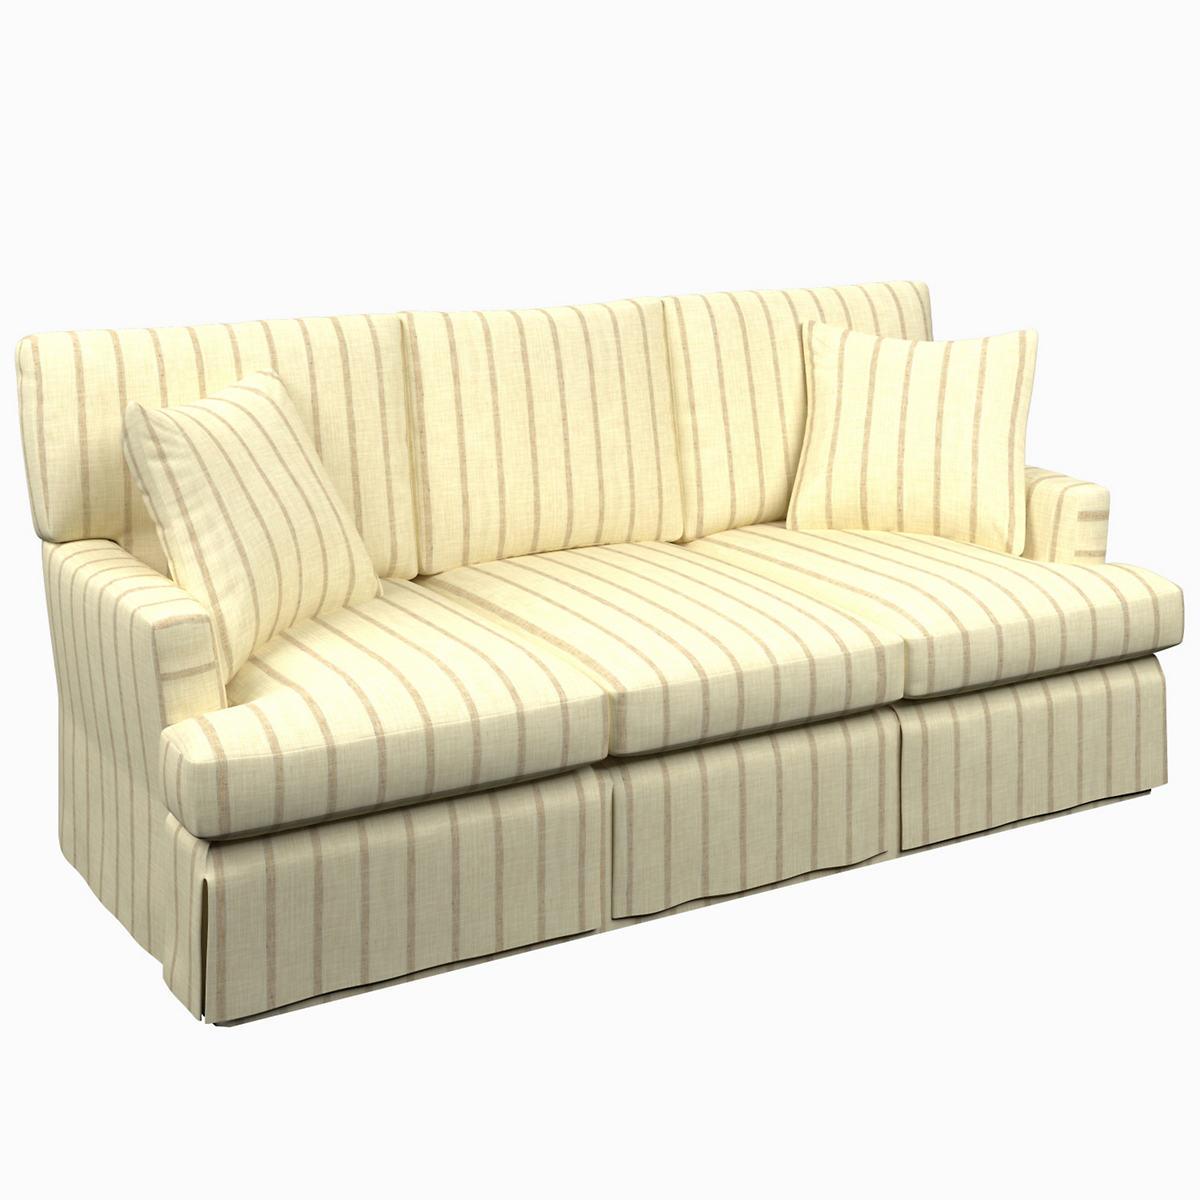 Glendale Stripe Natural/Grey Saybrook 3 Seater Sofa